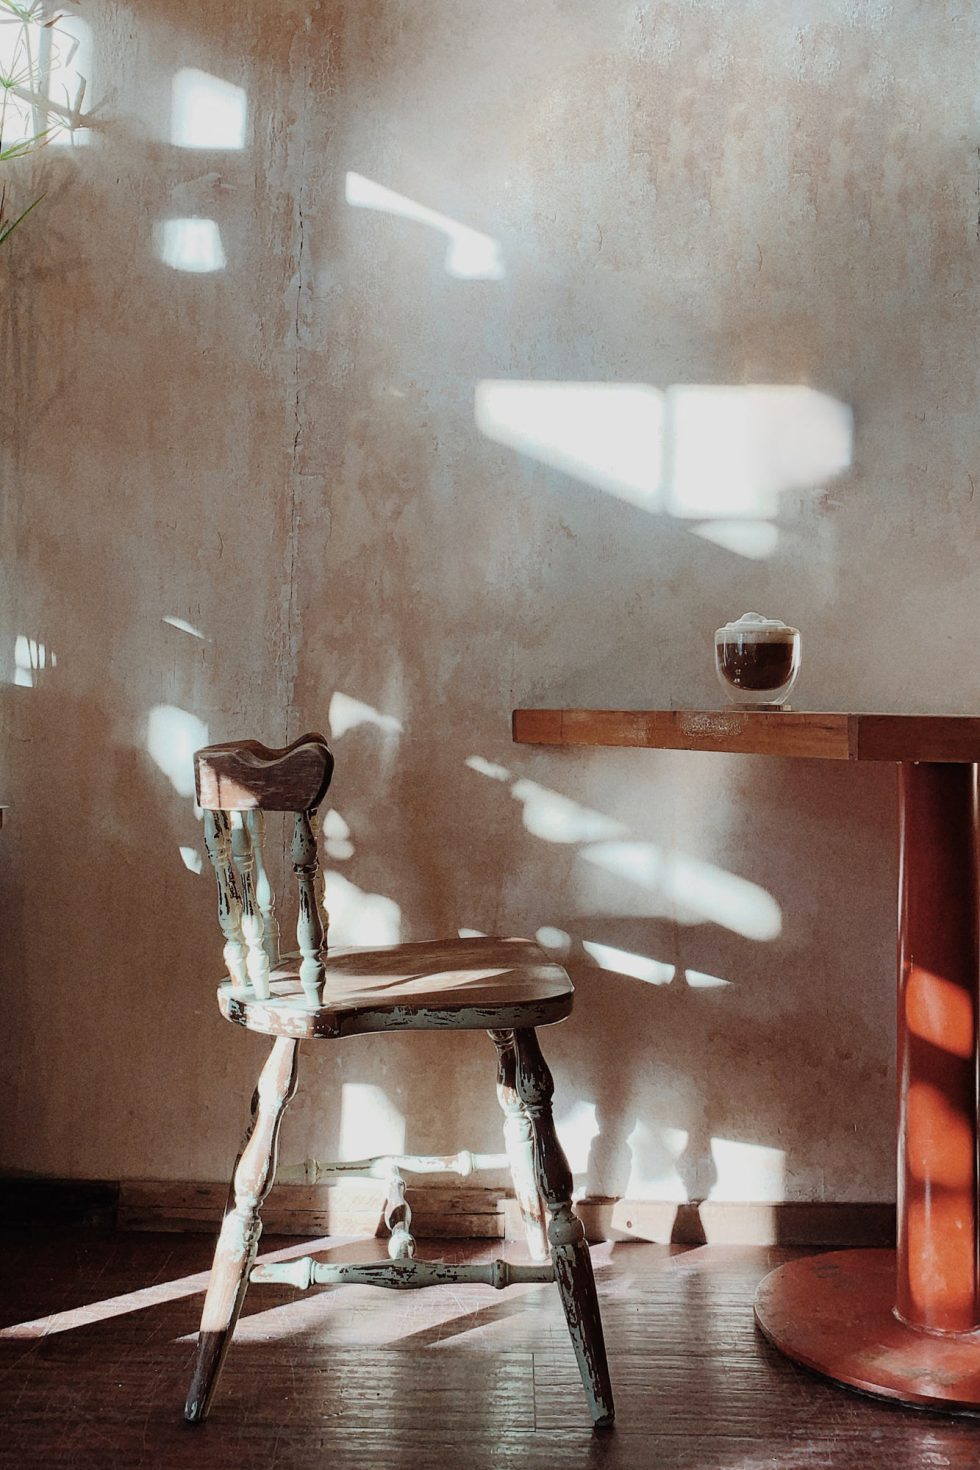 coffee-tea-shop-interior-design-montreal-lifestyle-photographer-laura-g-diaz